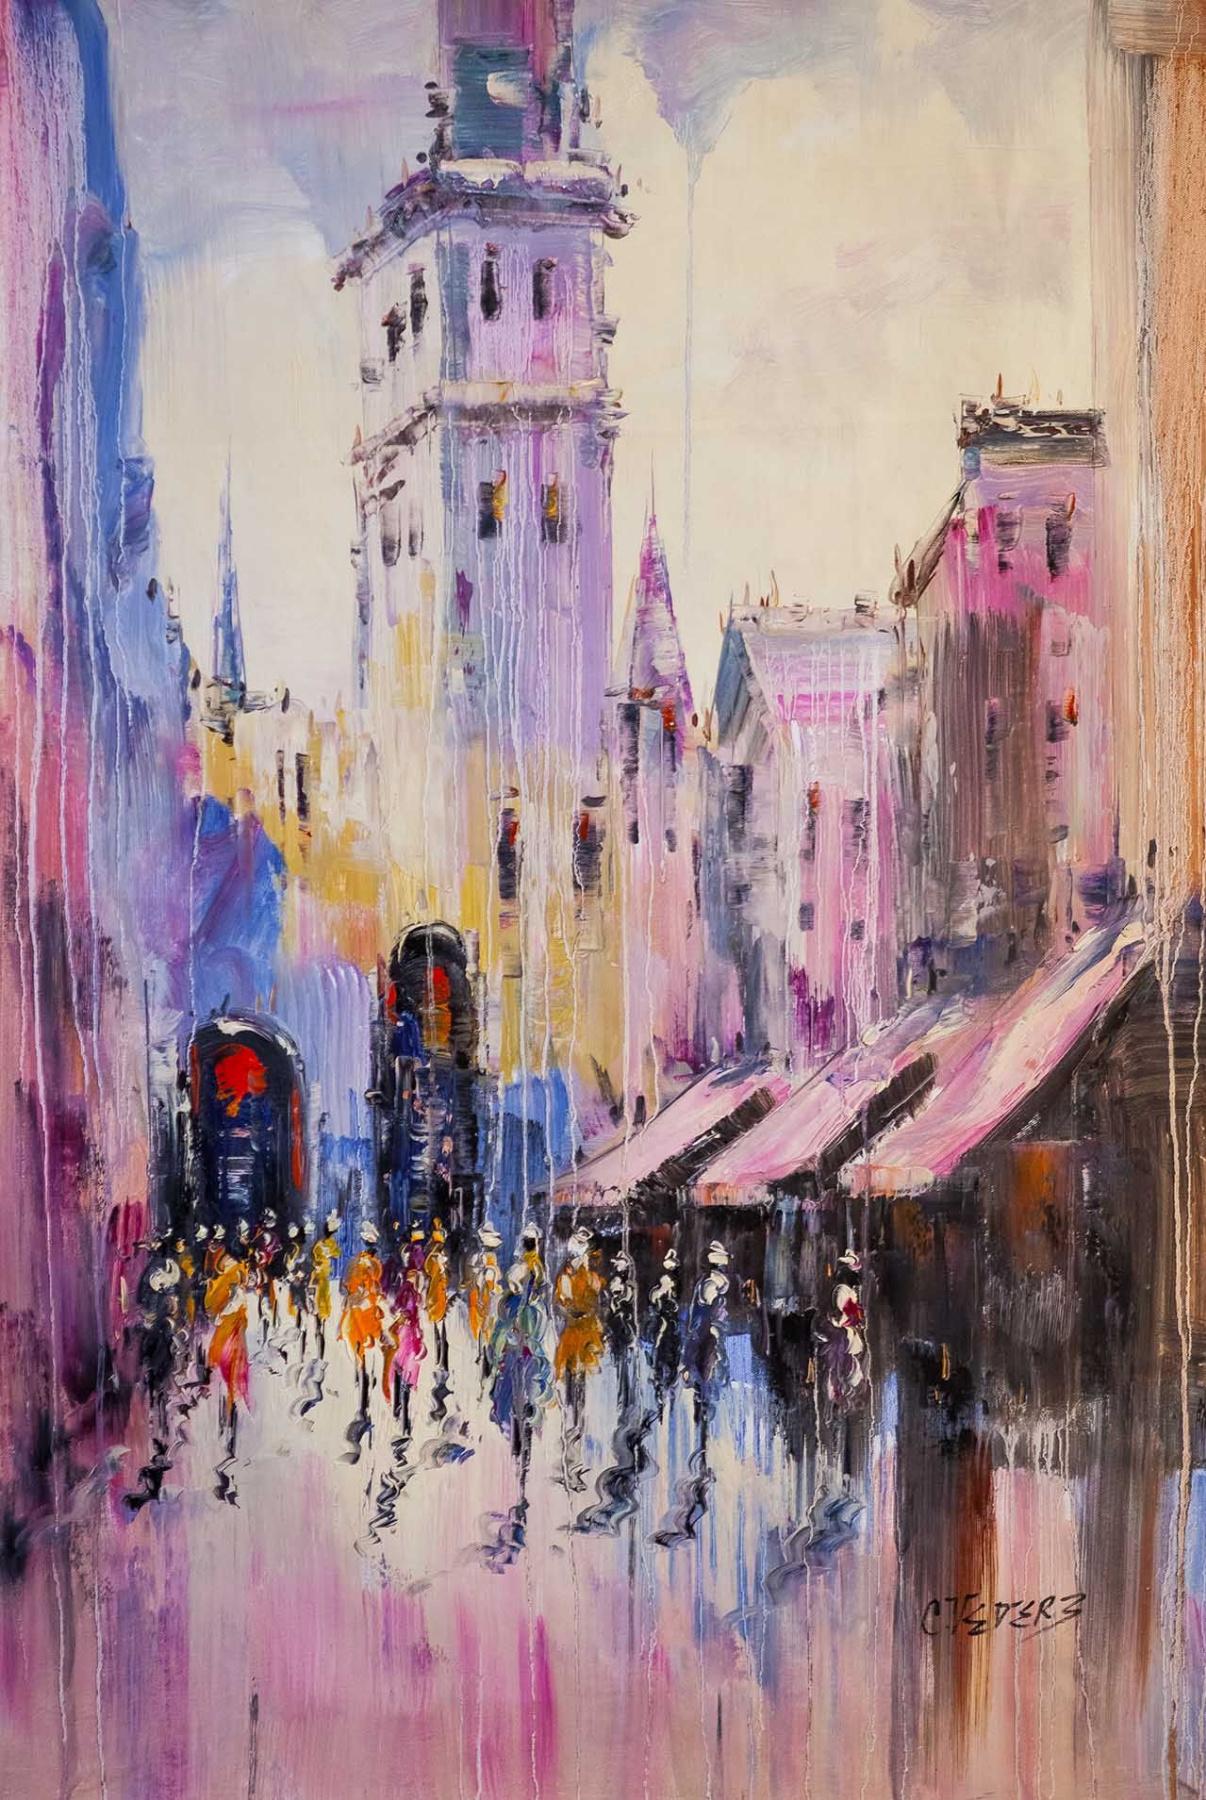 (no name). Urban sketches N9. Lilac tone